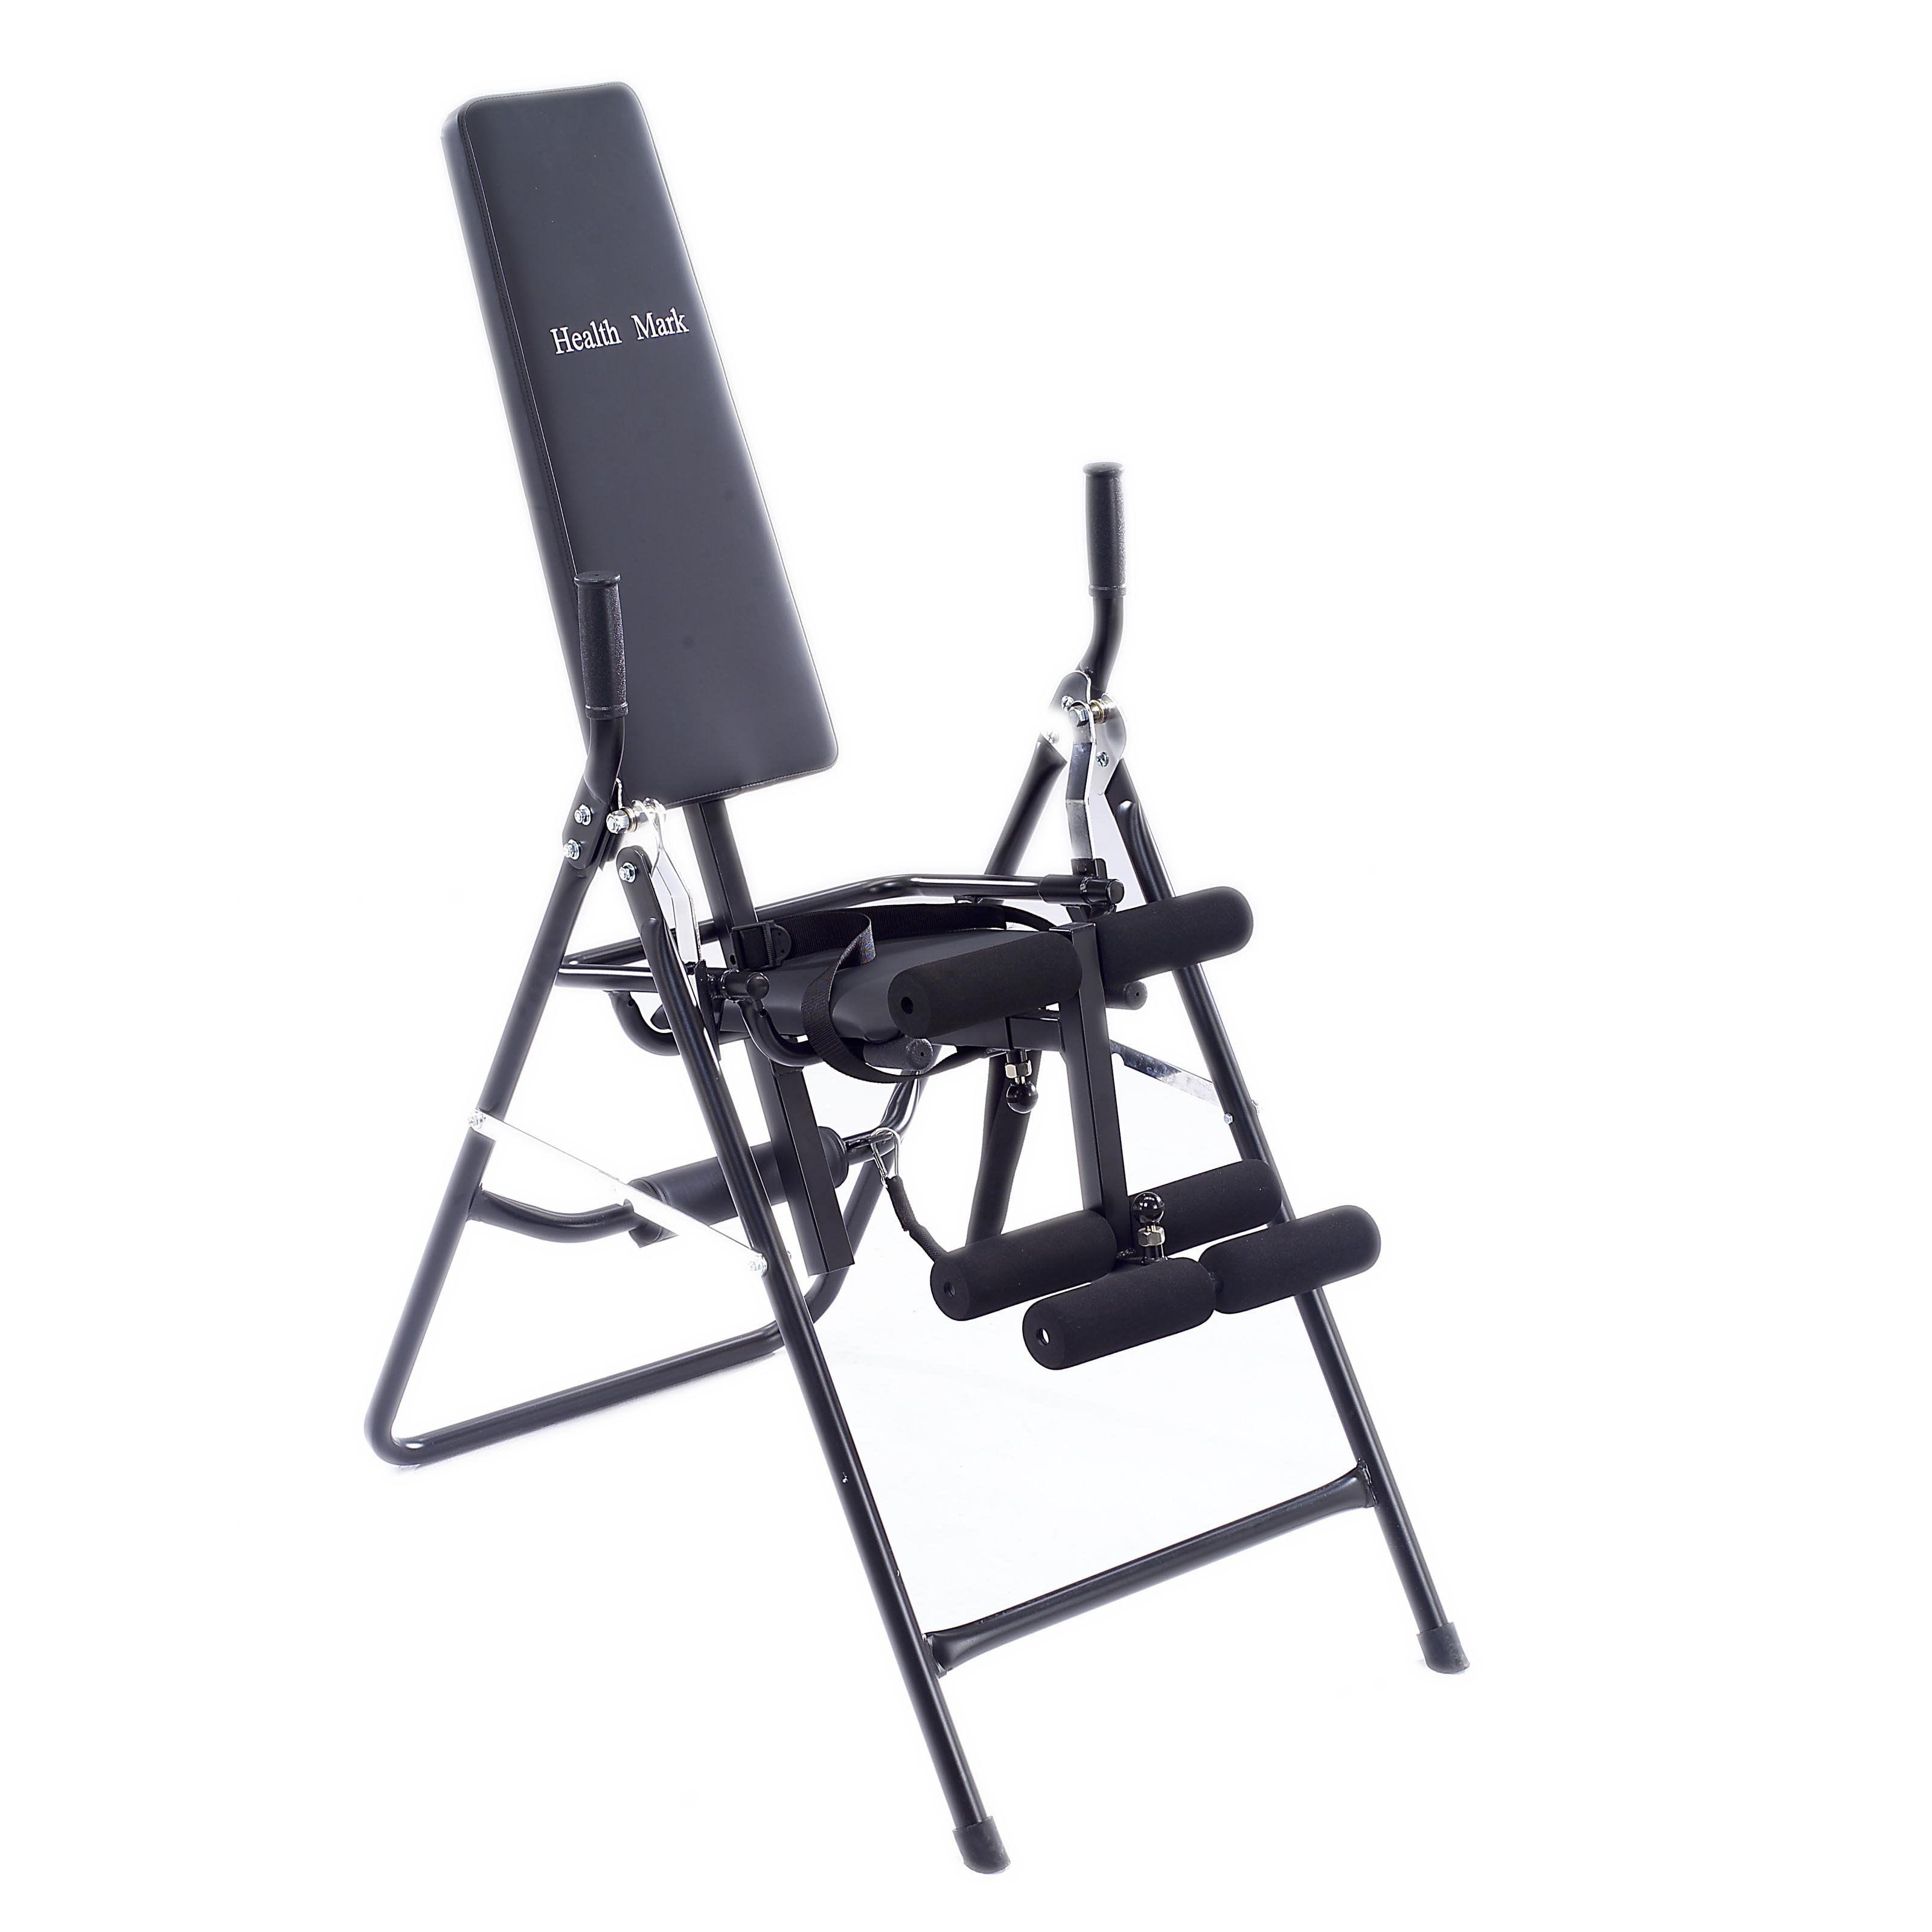 Health Mark IV Pro Inversion Therapy Chair Walmart